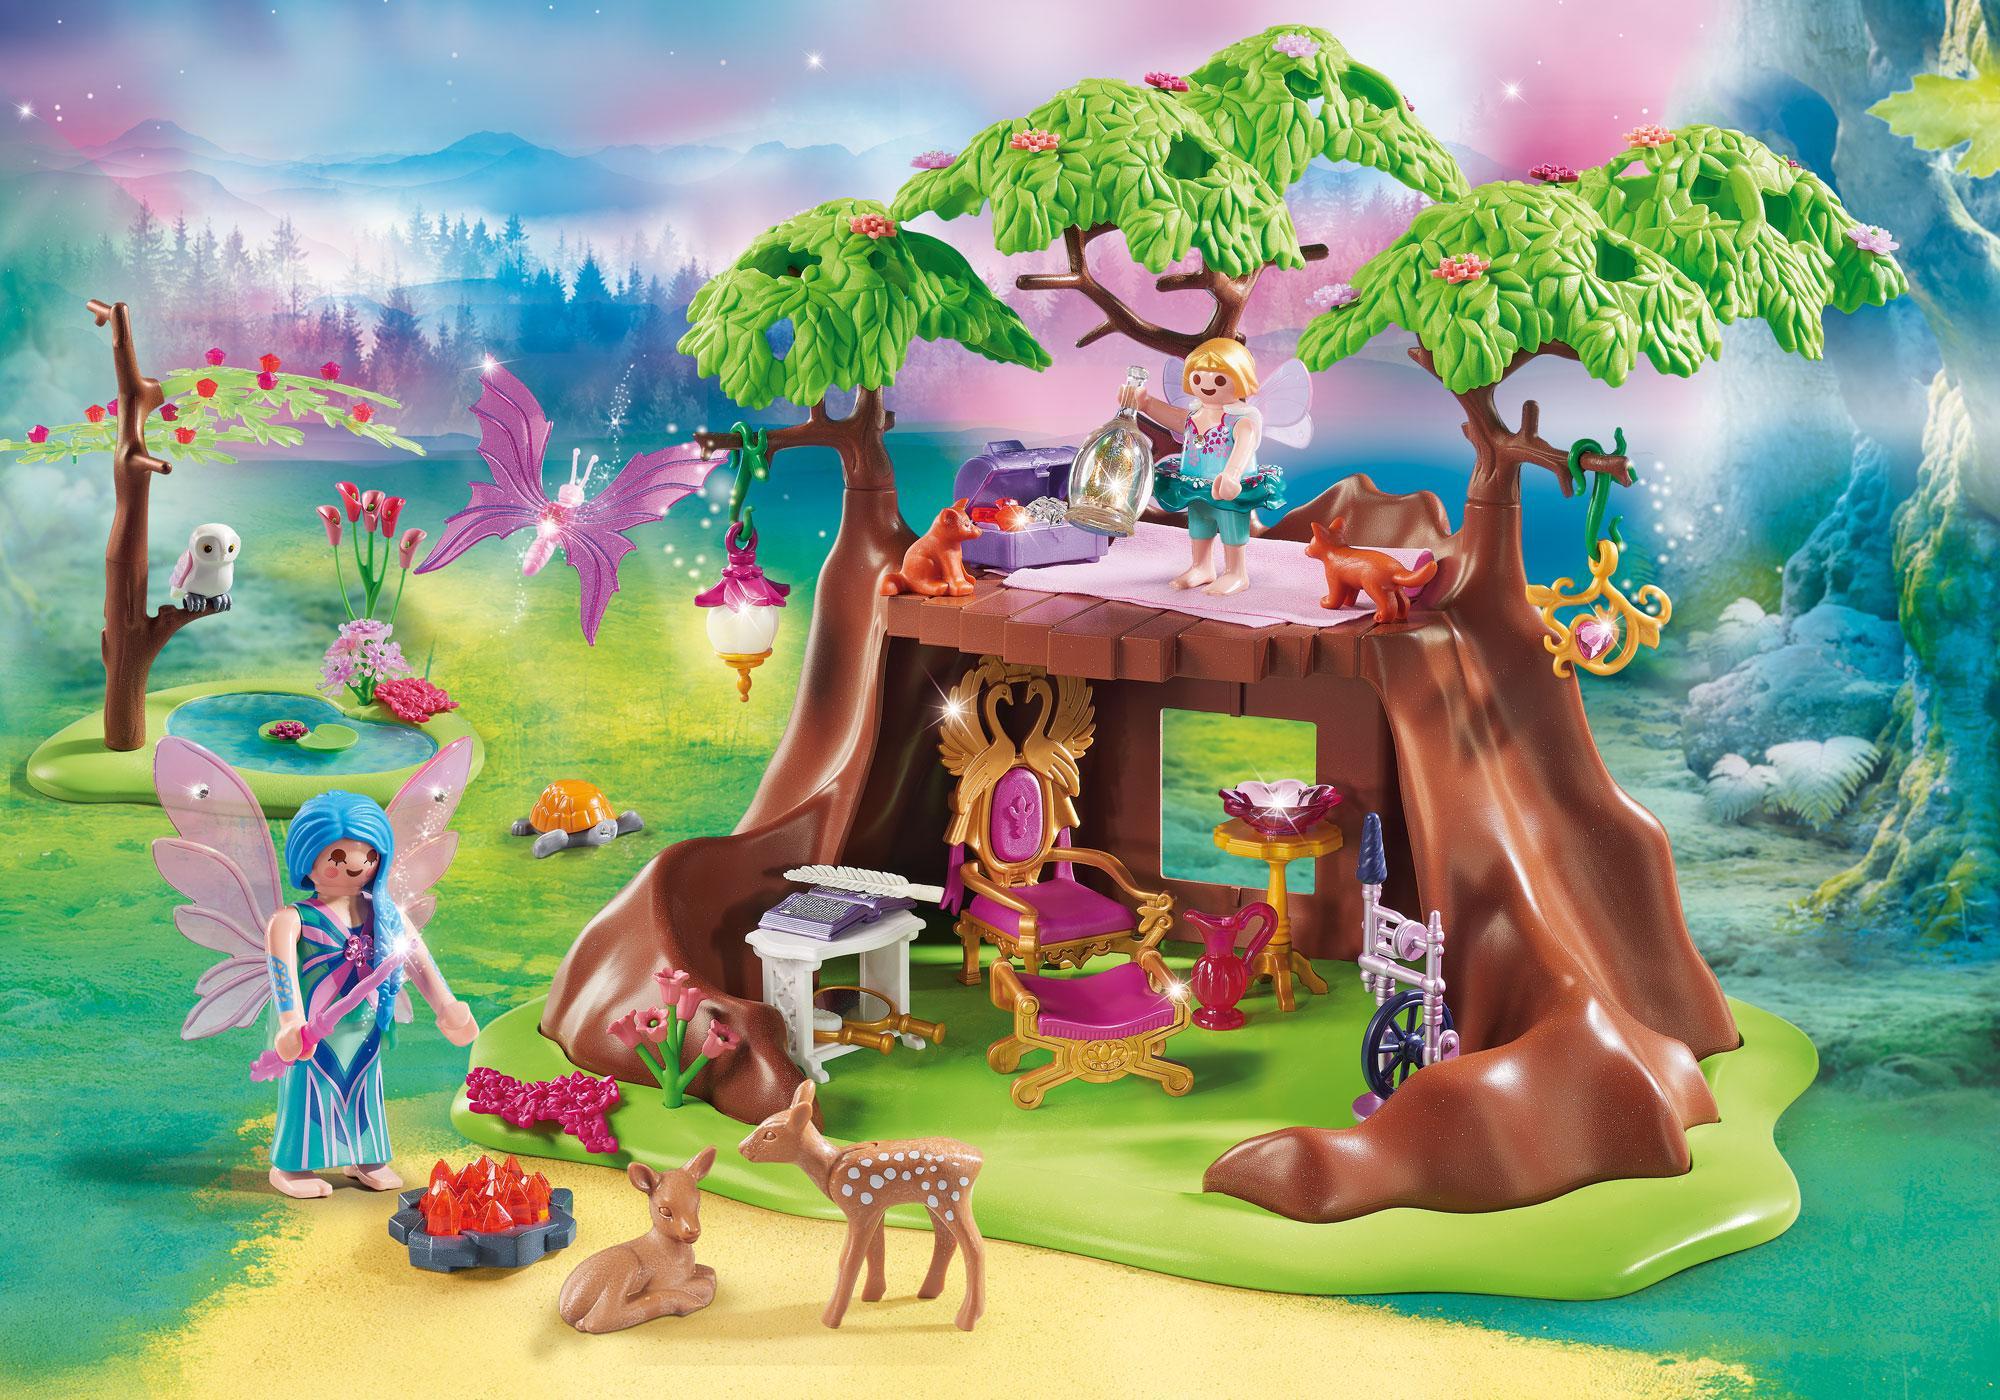 http://media.playmobil.com/i/playmobil/70001_product_detail/Fehus i skoven